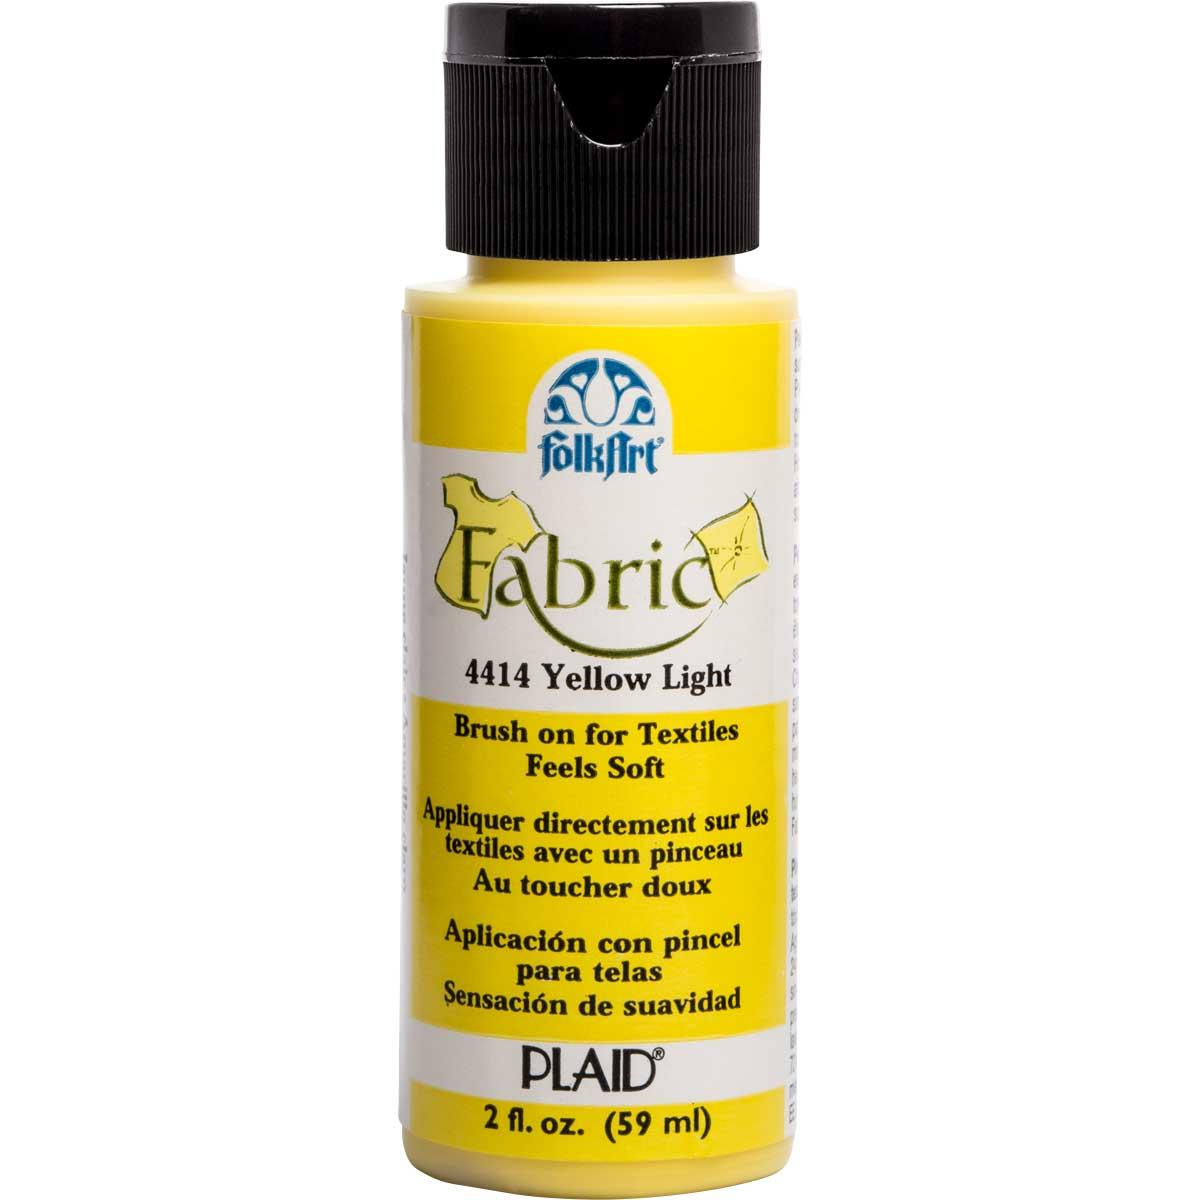 FolkArt ® Fabric™ Paint - Brush On - Yellow Light - 4414